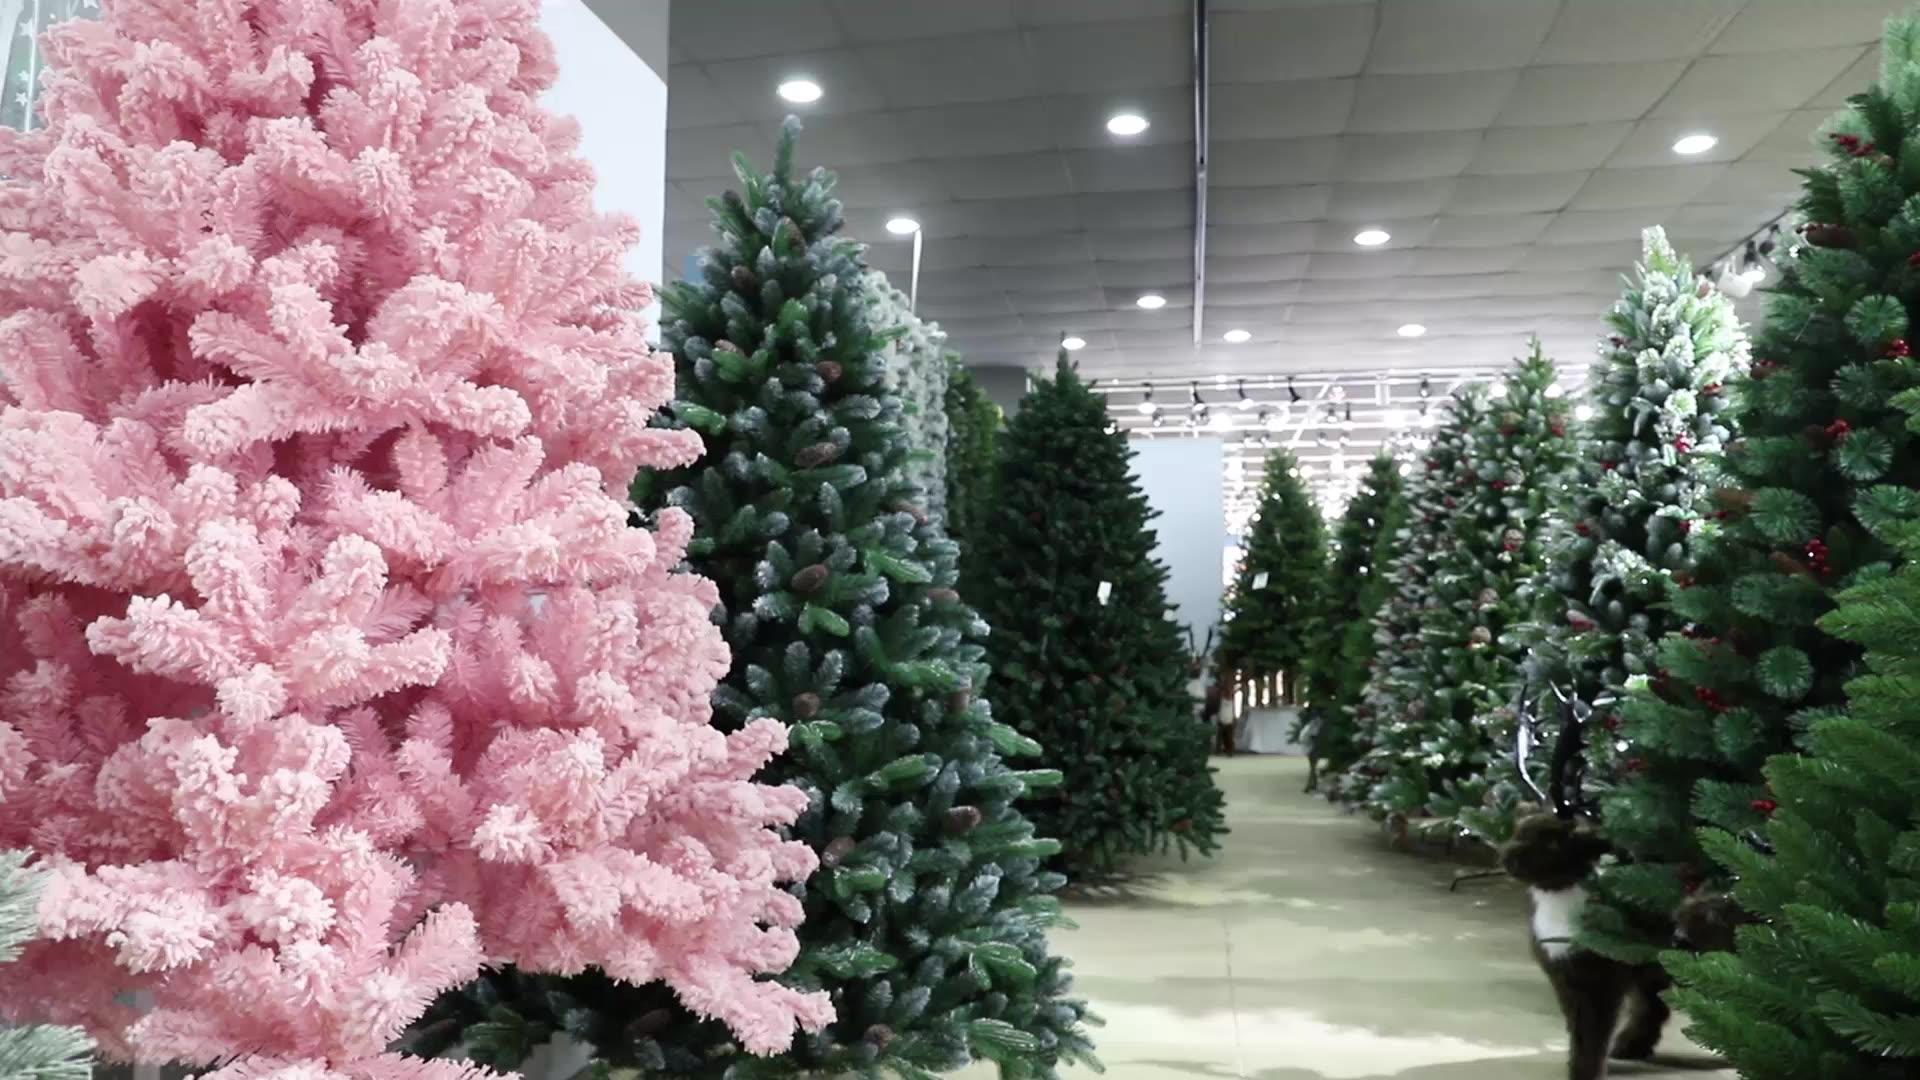 Luxury 210cm mixed Leaf Christmas  Decorative tree with warm white LED lights